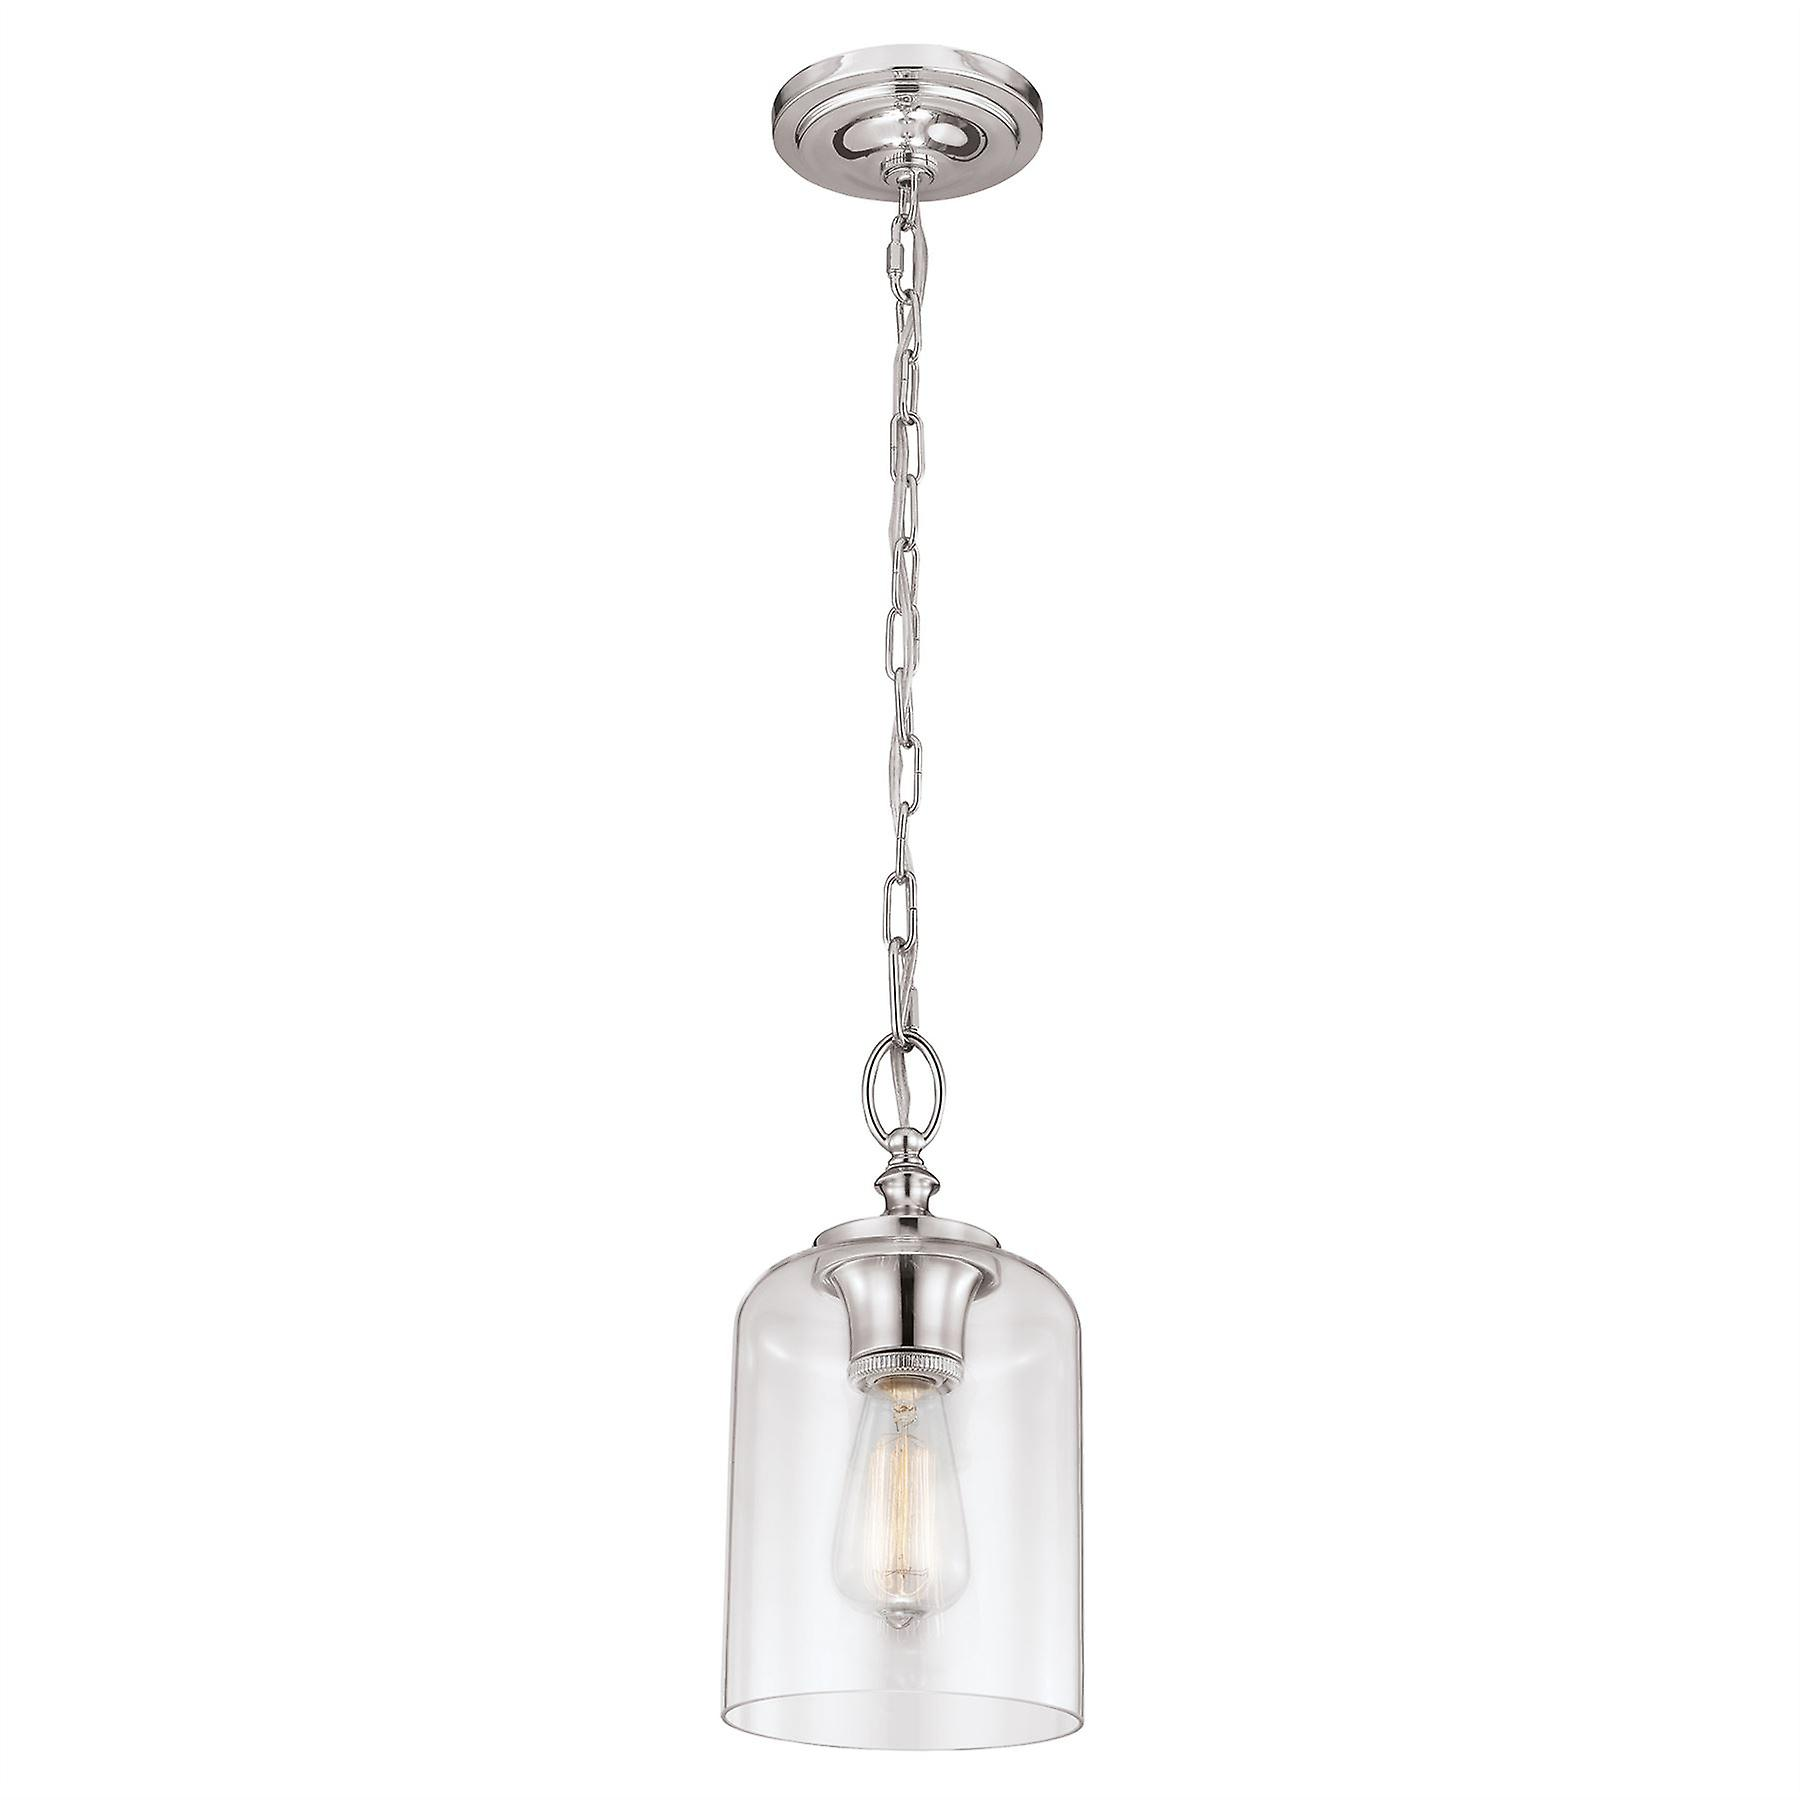 HounsFaible Mini pendentif Polished Nickel - Elstead lumièreing